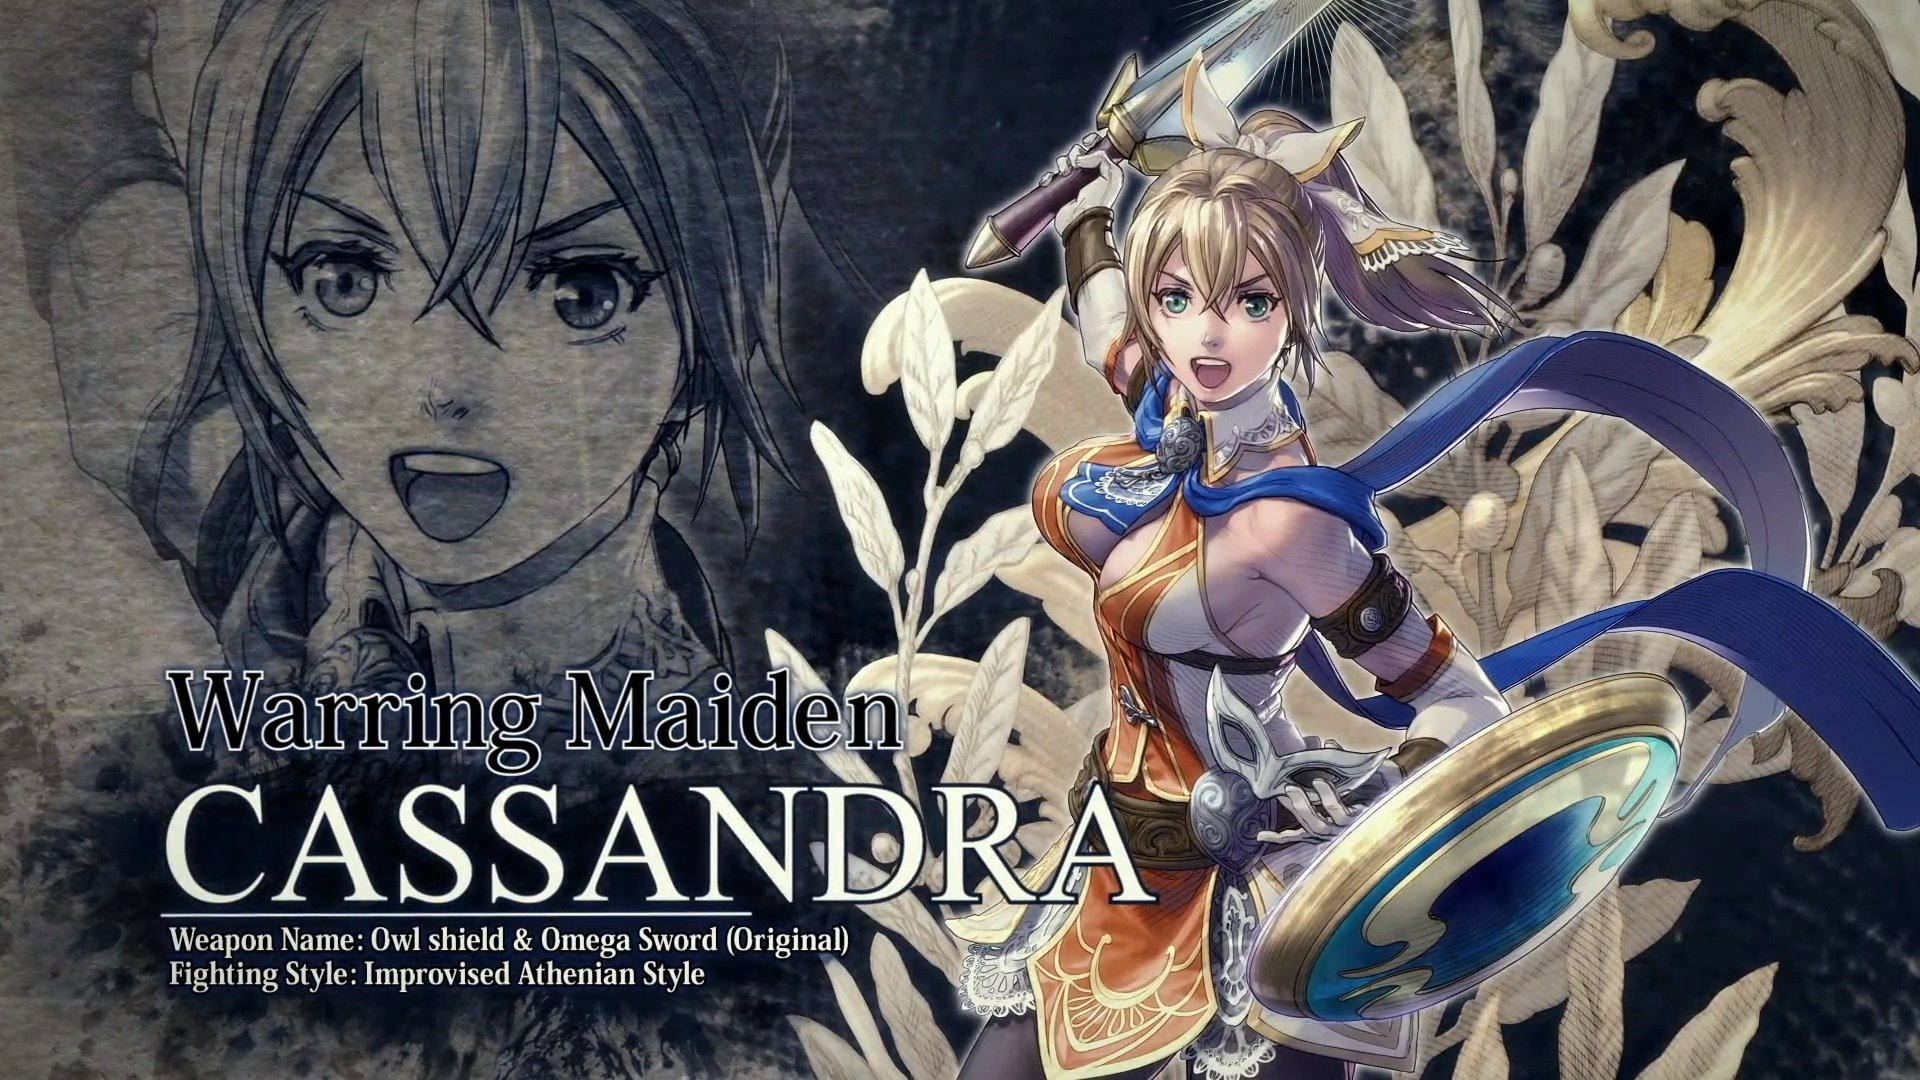 Soul Calibur VI Cassandra Arrives Today as Final Season 1